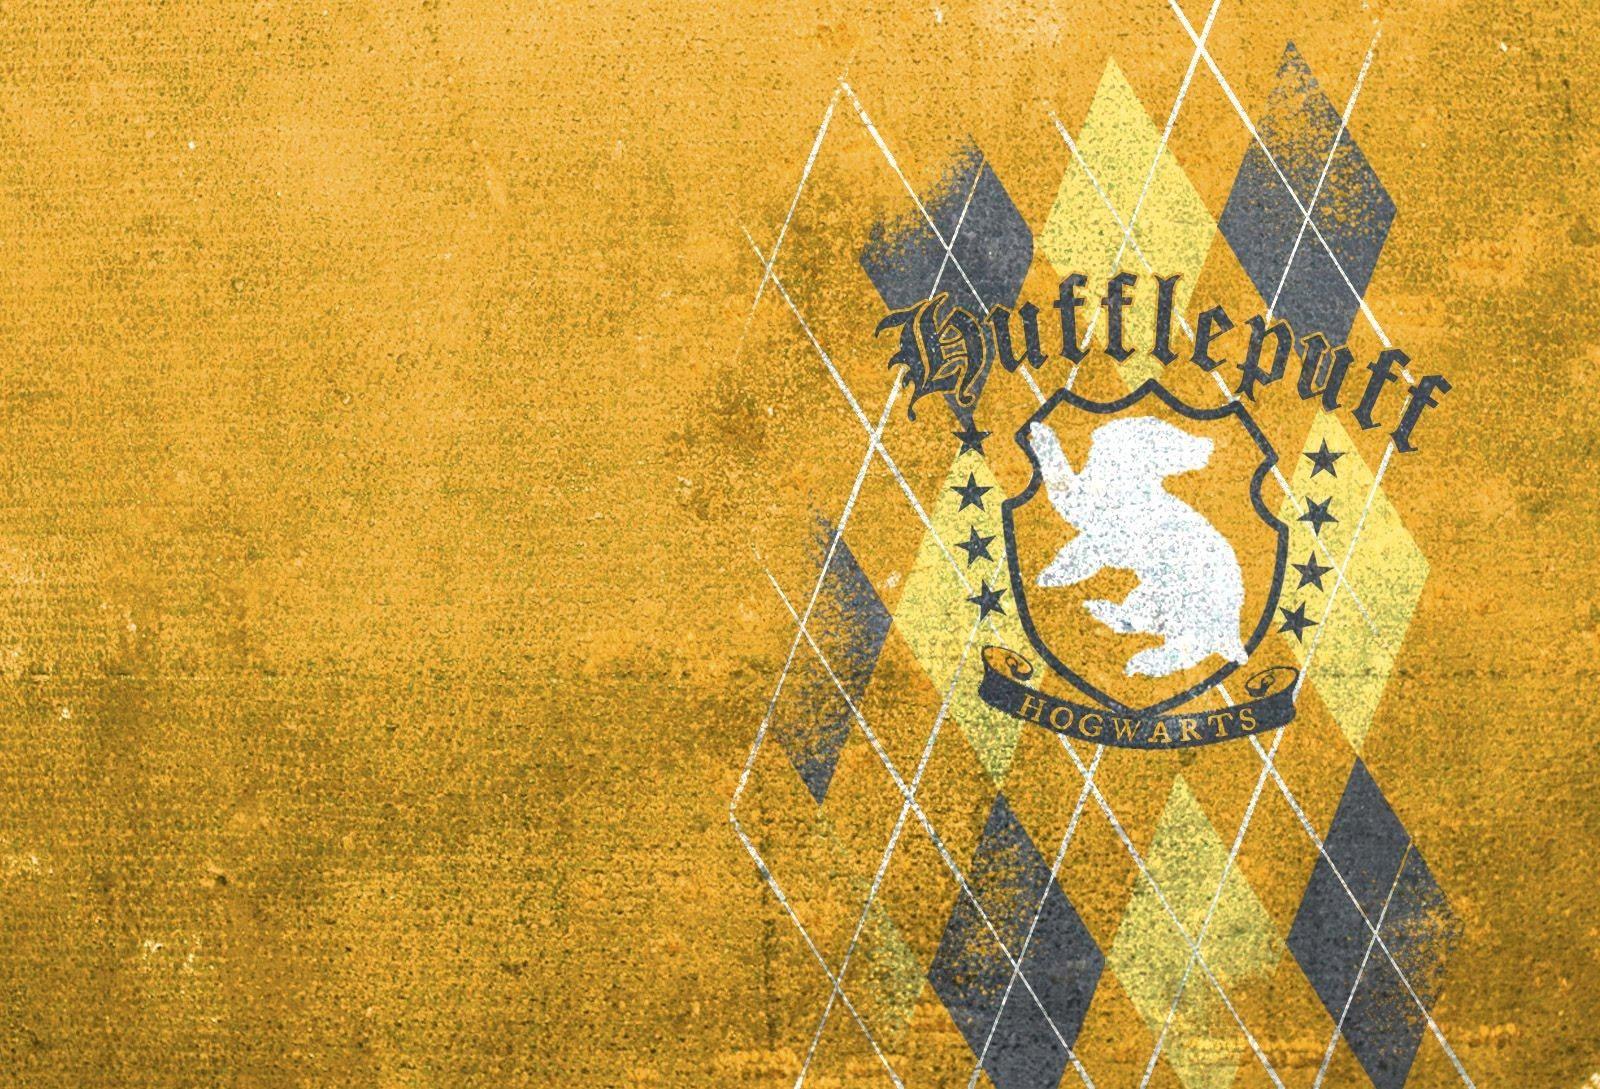 Hufflepuff Mac Wallpaper In 2020 Harry Potter Wallpaper Hufflepuff Wallpaper Harry Potter Aesthetic